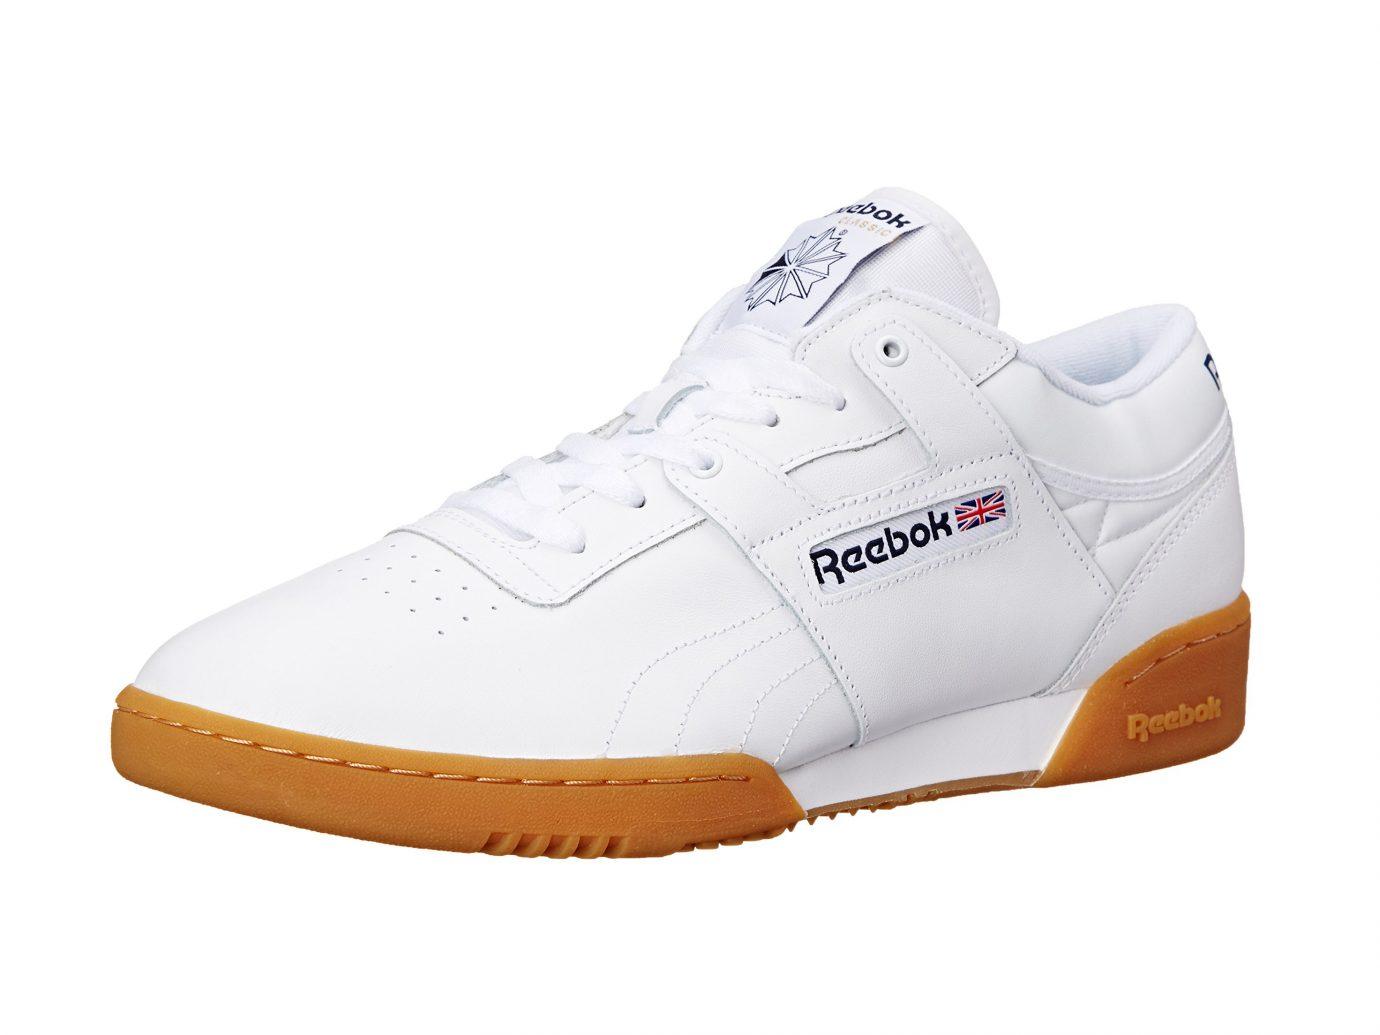 Reebok Men's Workout Low Classic Shoe